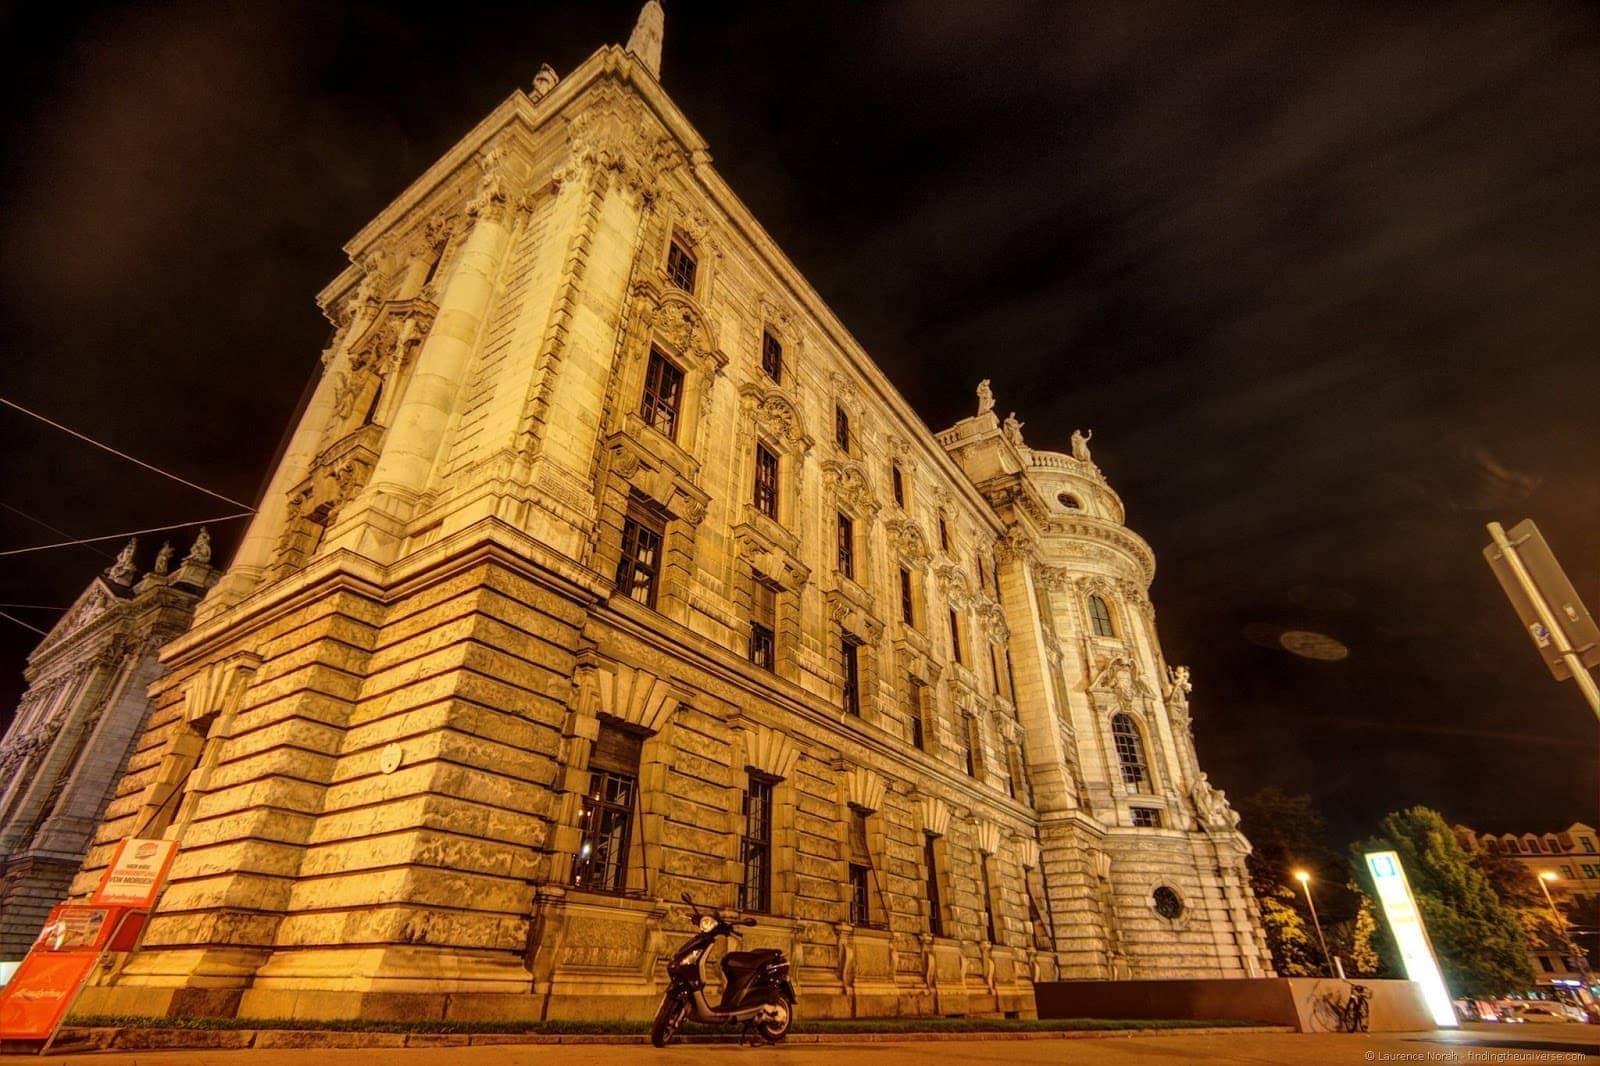 Munich palace of Justice night edited